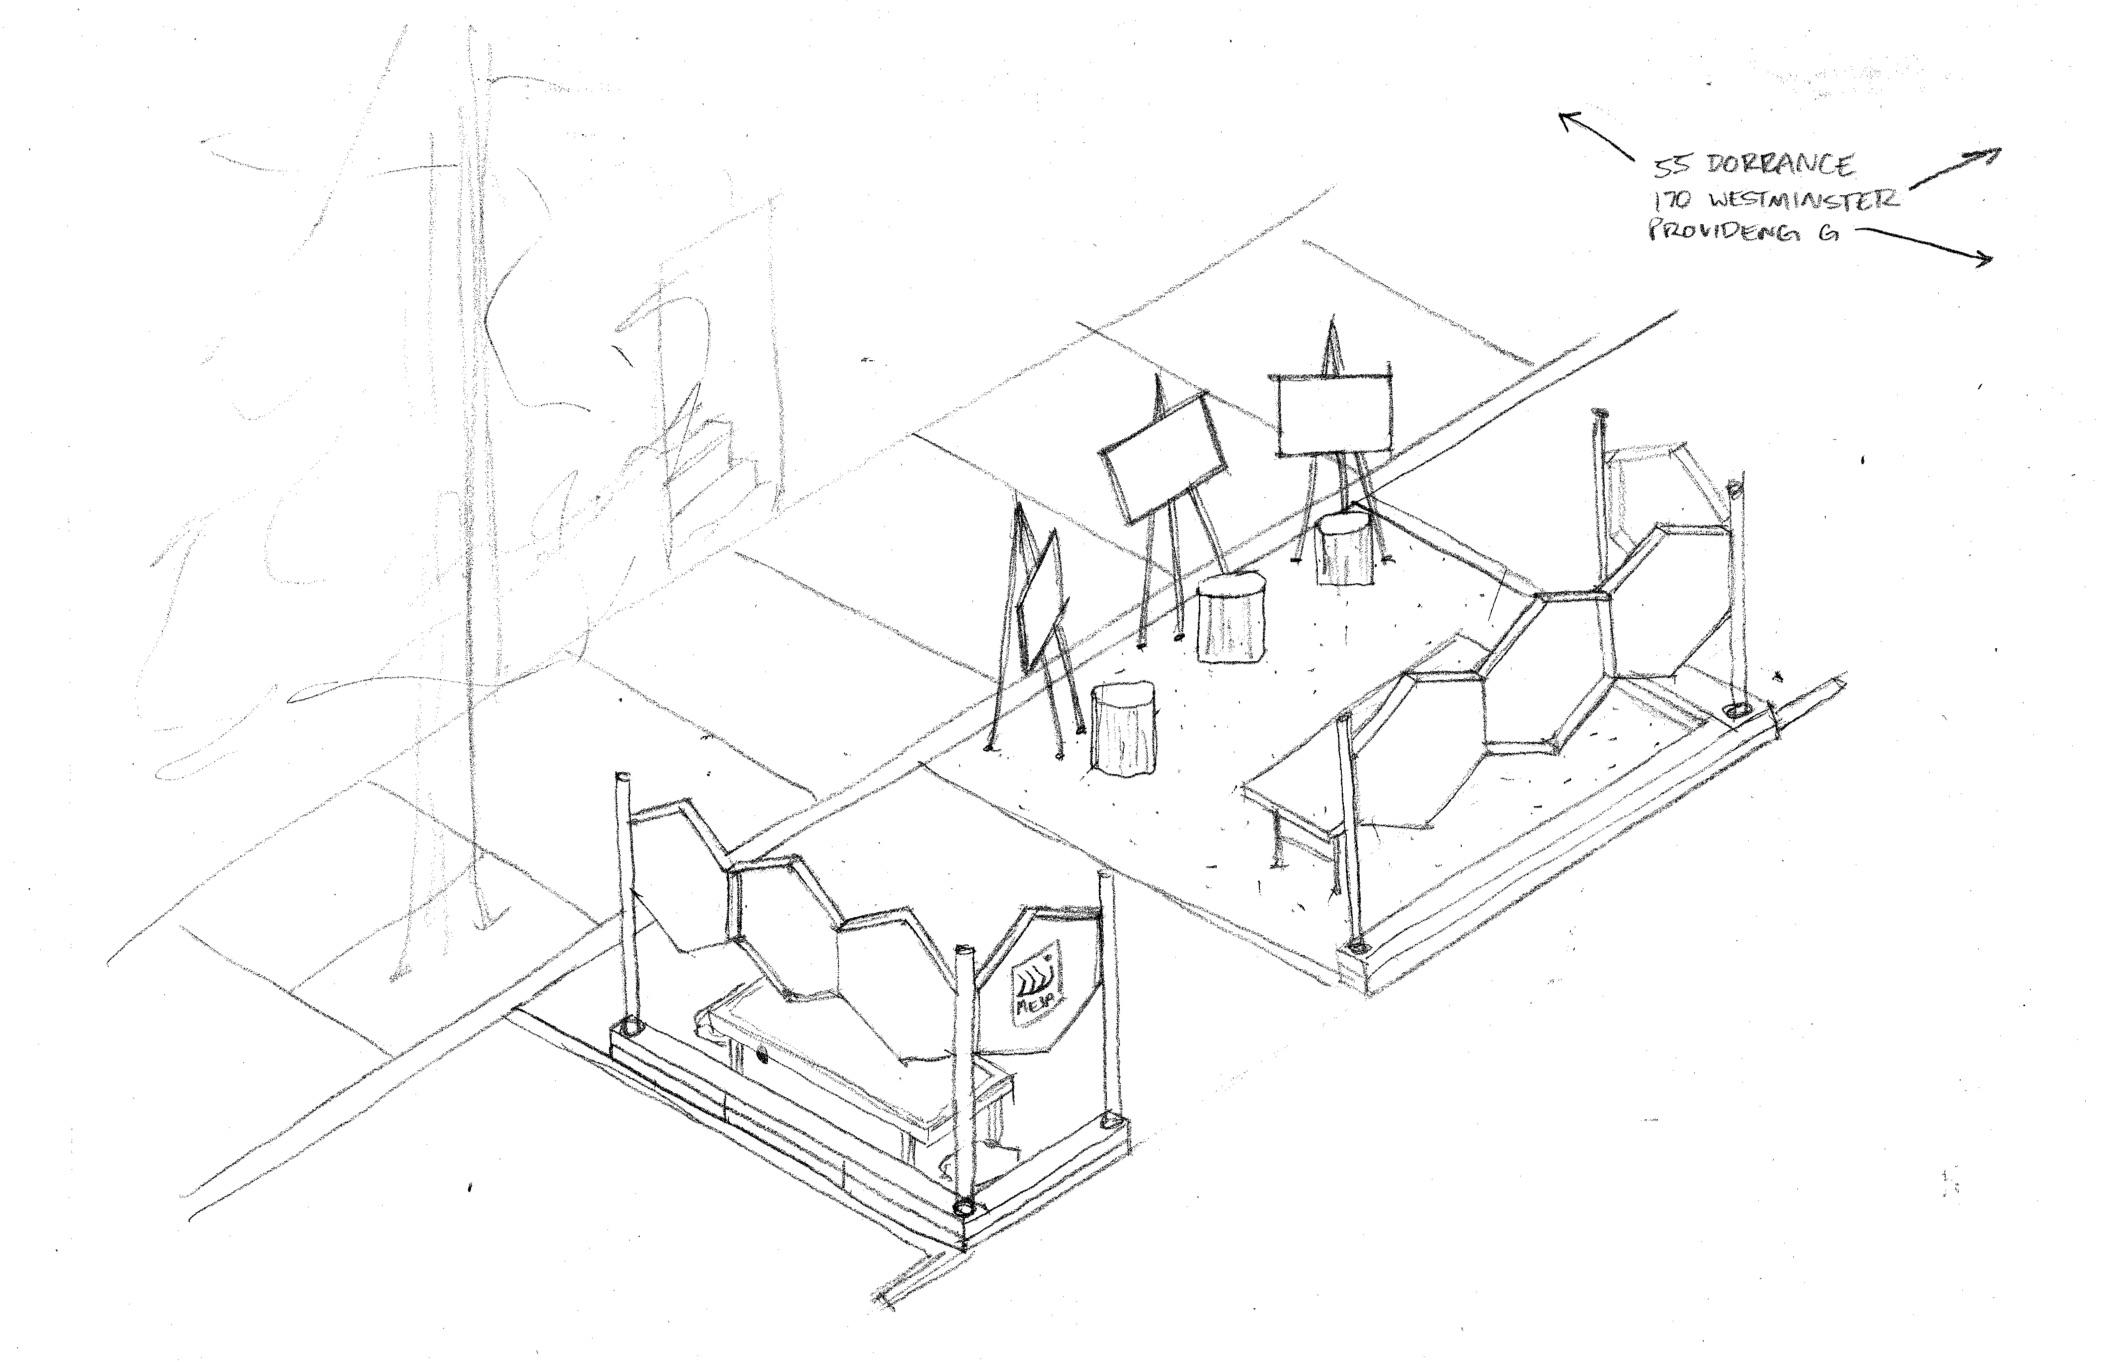 Preliminary design proposal.